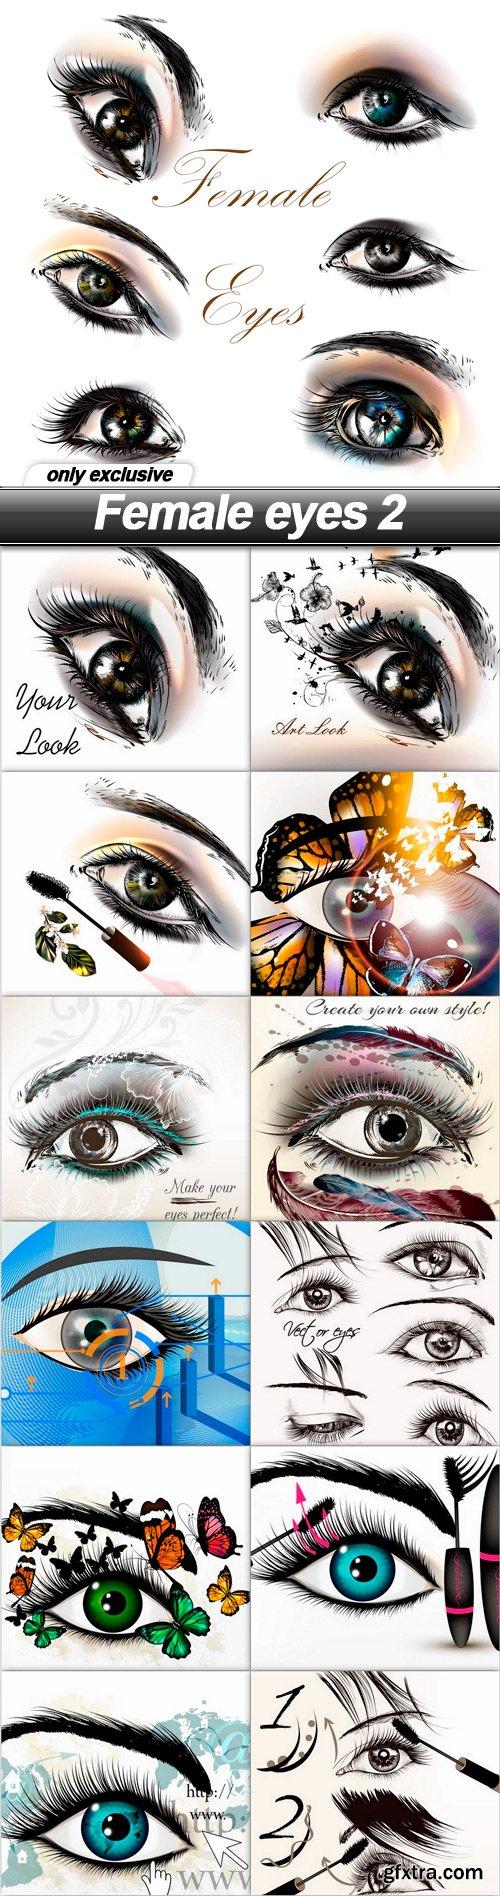 Female eyes 2 - 13 EPS